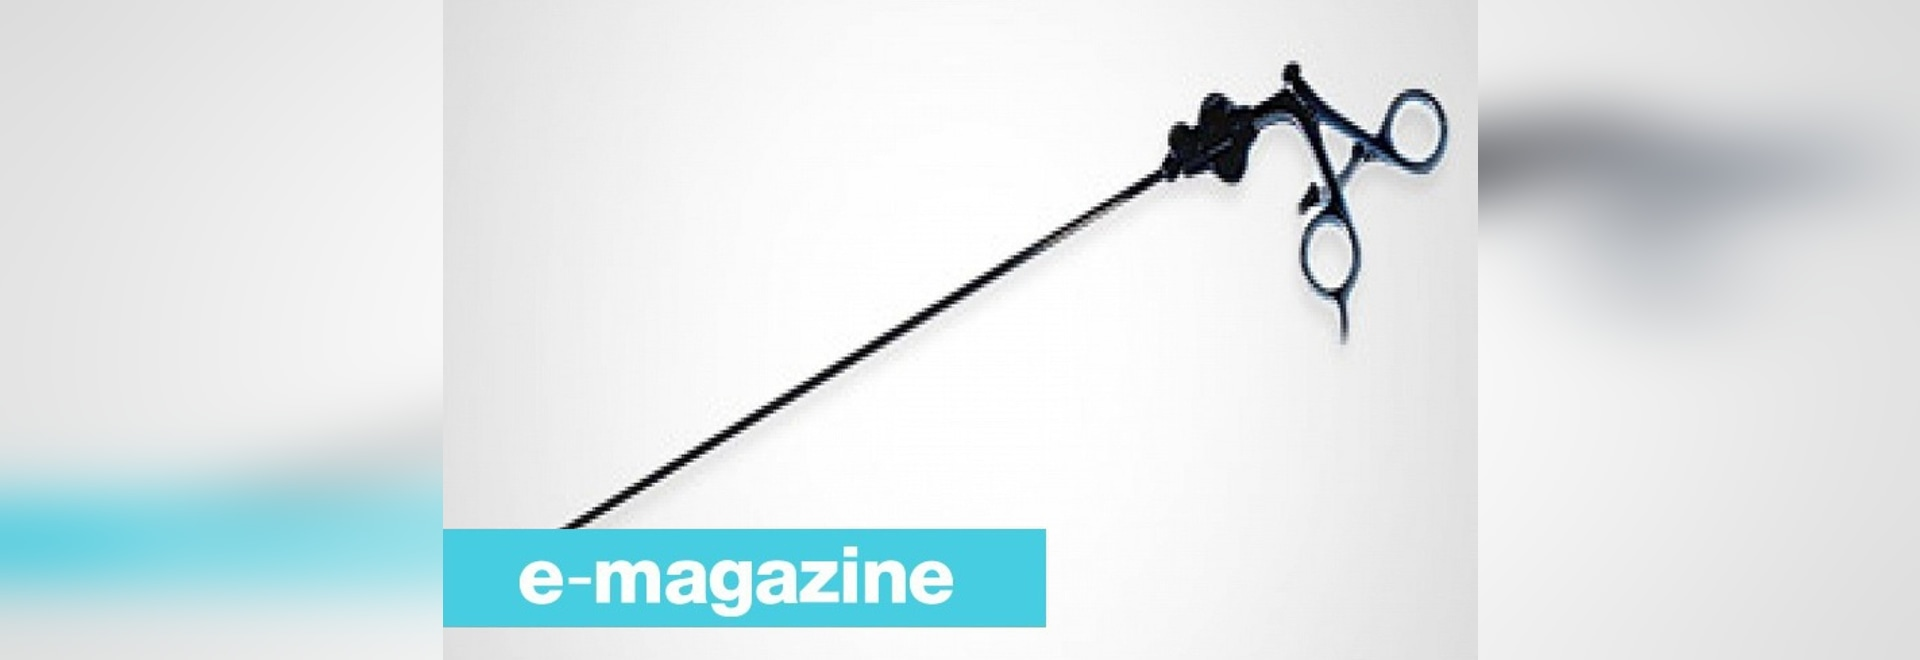 Stryker Presents 5-Mm Laparoscopic Instruments in 45-Cm Length